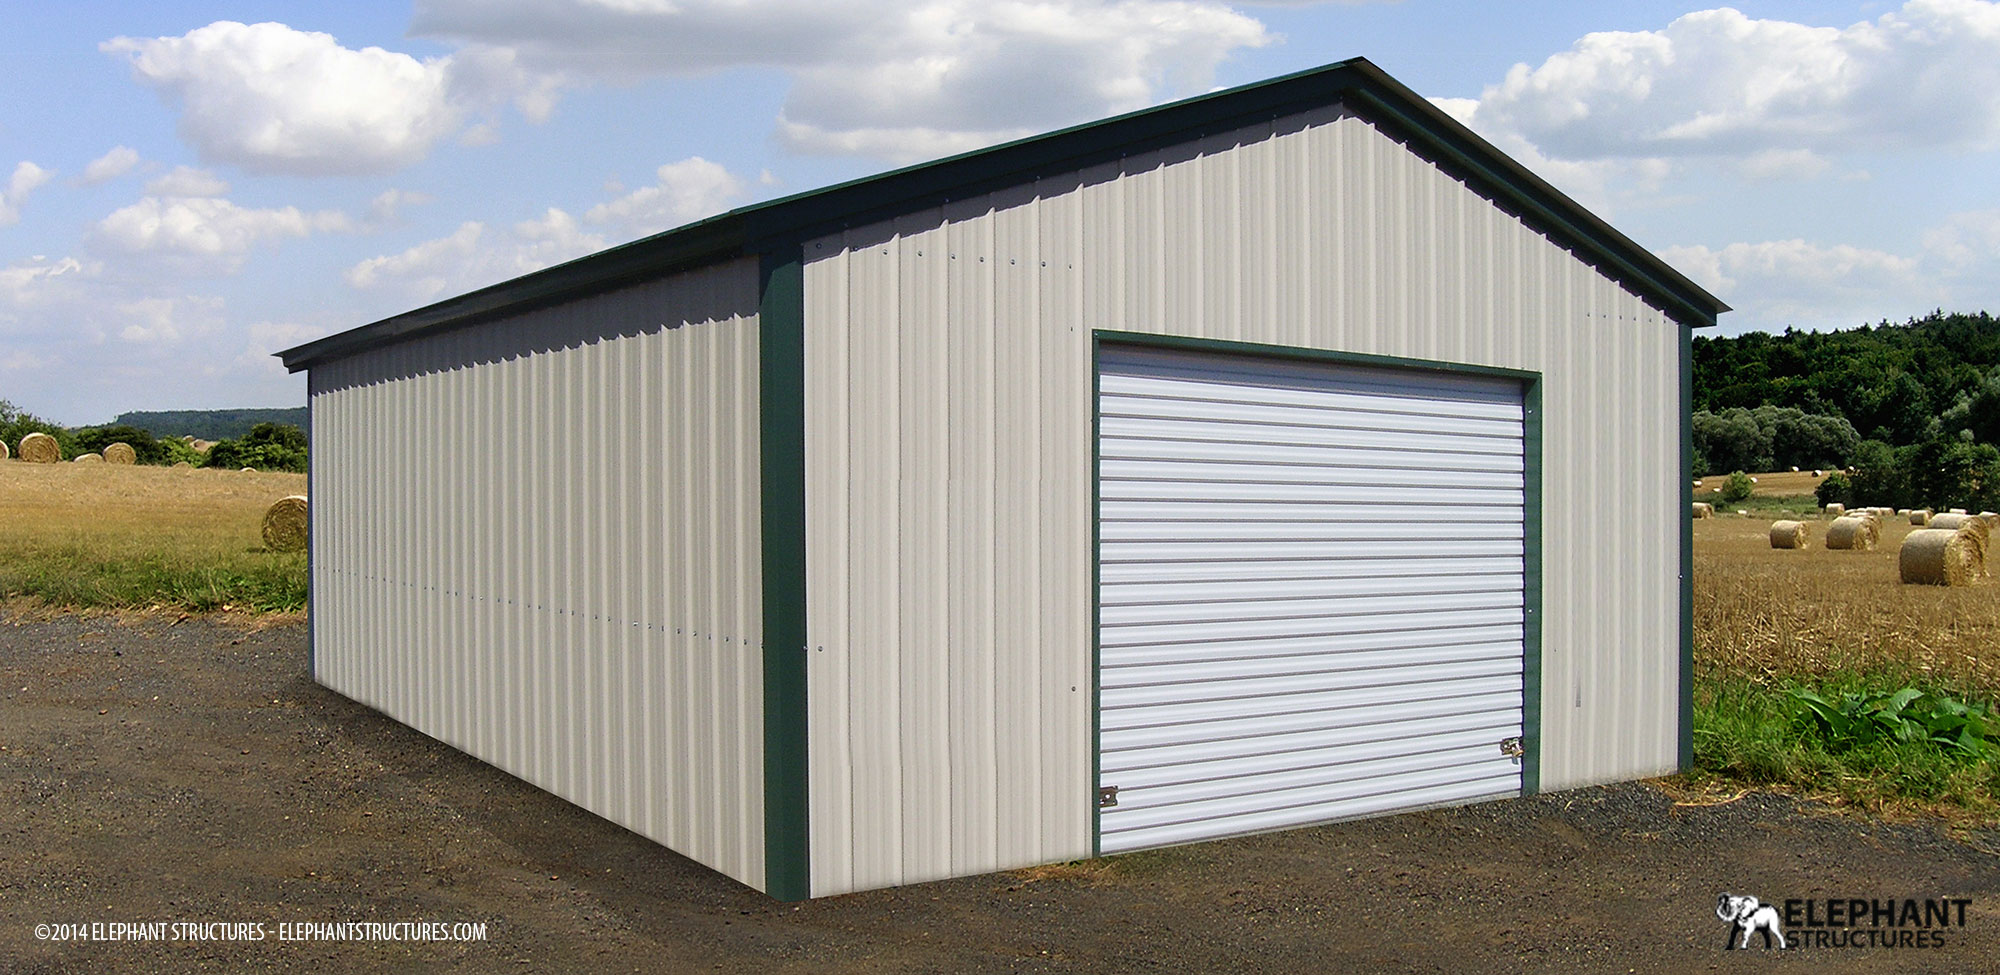 Metal Buildings Garages Carports Barns Online Elephant Structures